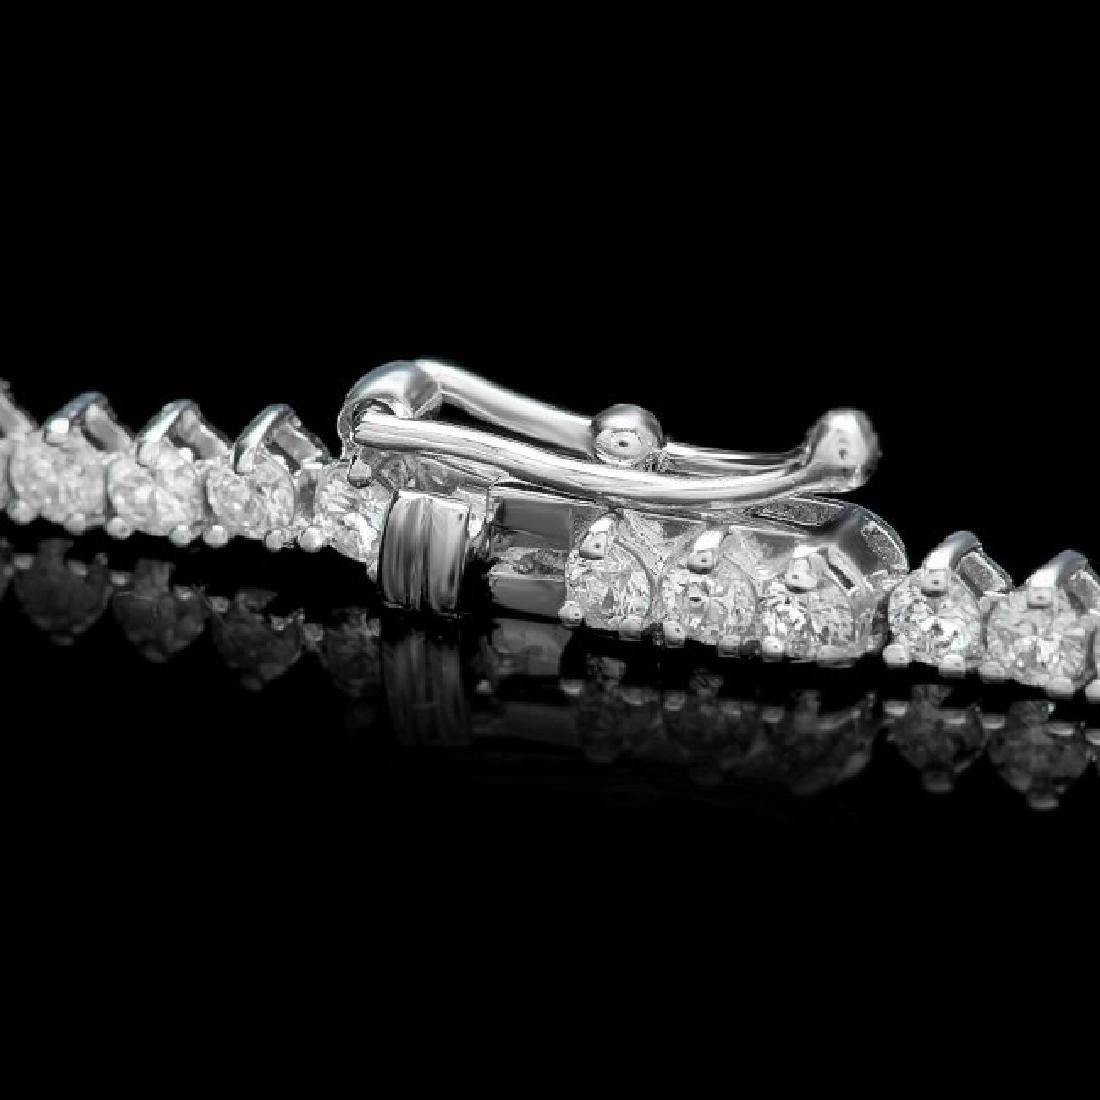 14k White Gold 9.30ct Diamond Necklace - 3